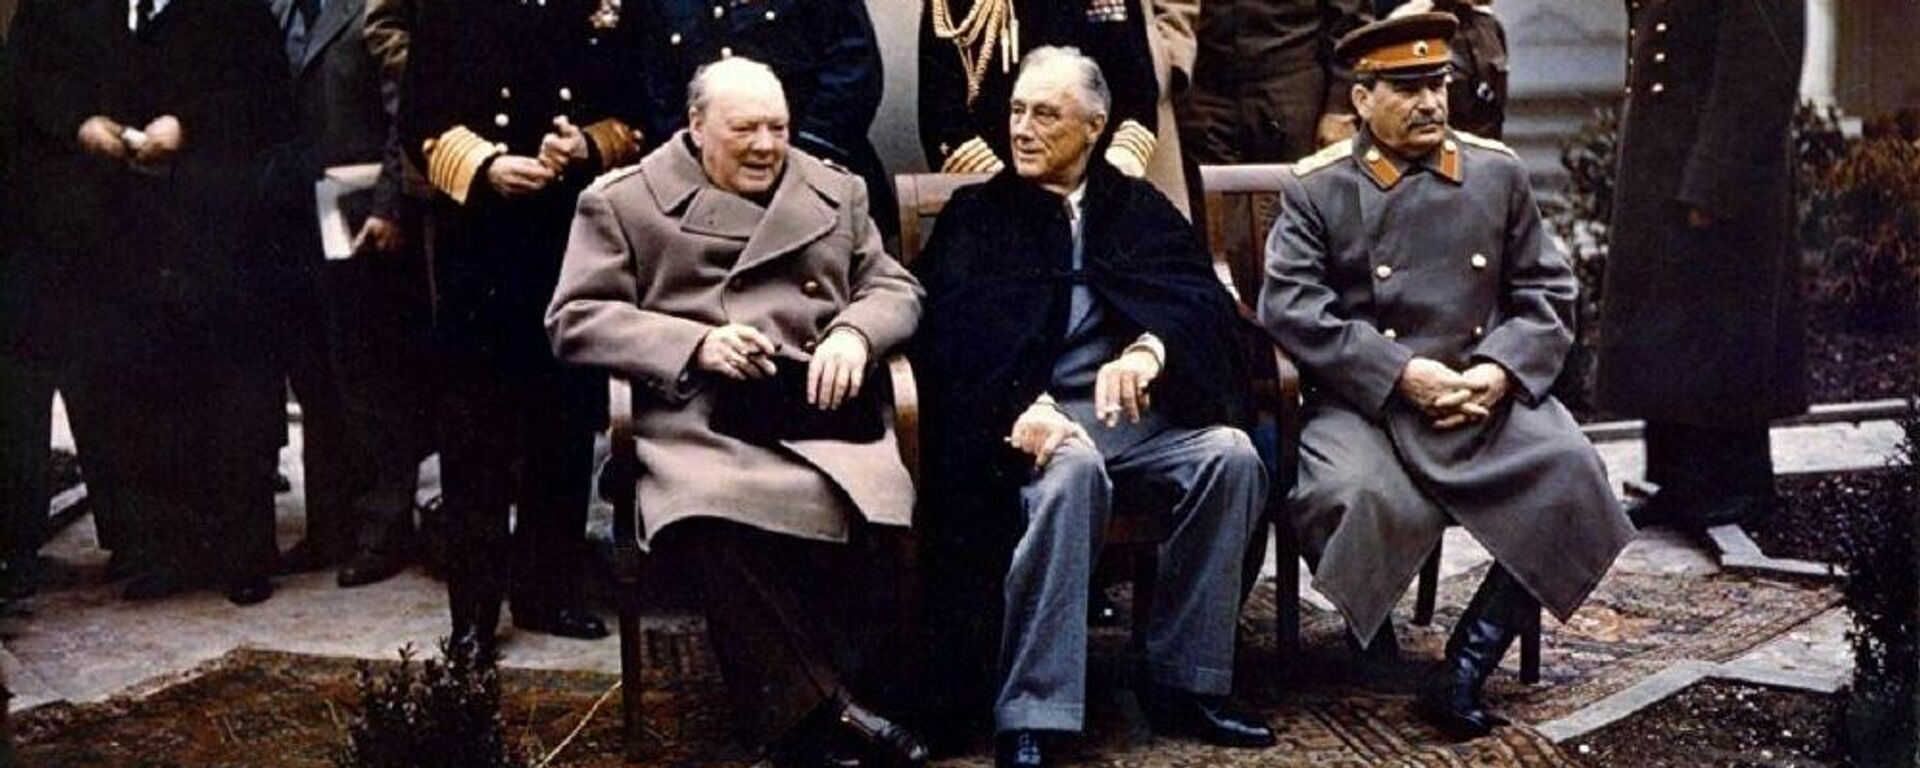 v.l.n.r.: Winston Churchill, Franklin D Roosevelt, Josef Stalin auf der Konferenz von Jalta 1945 - SNA, 1920, 13.08.2021